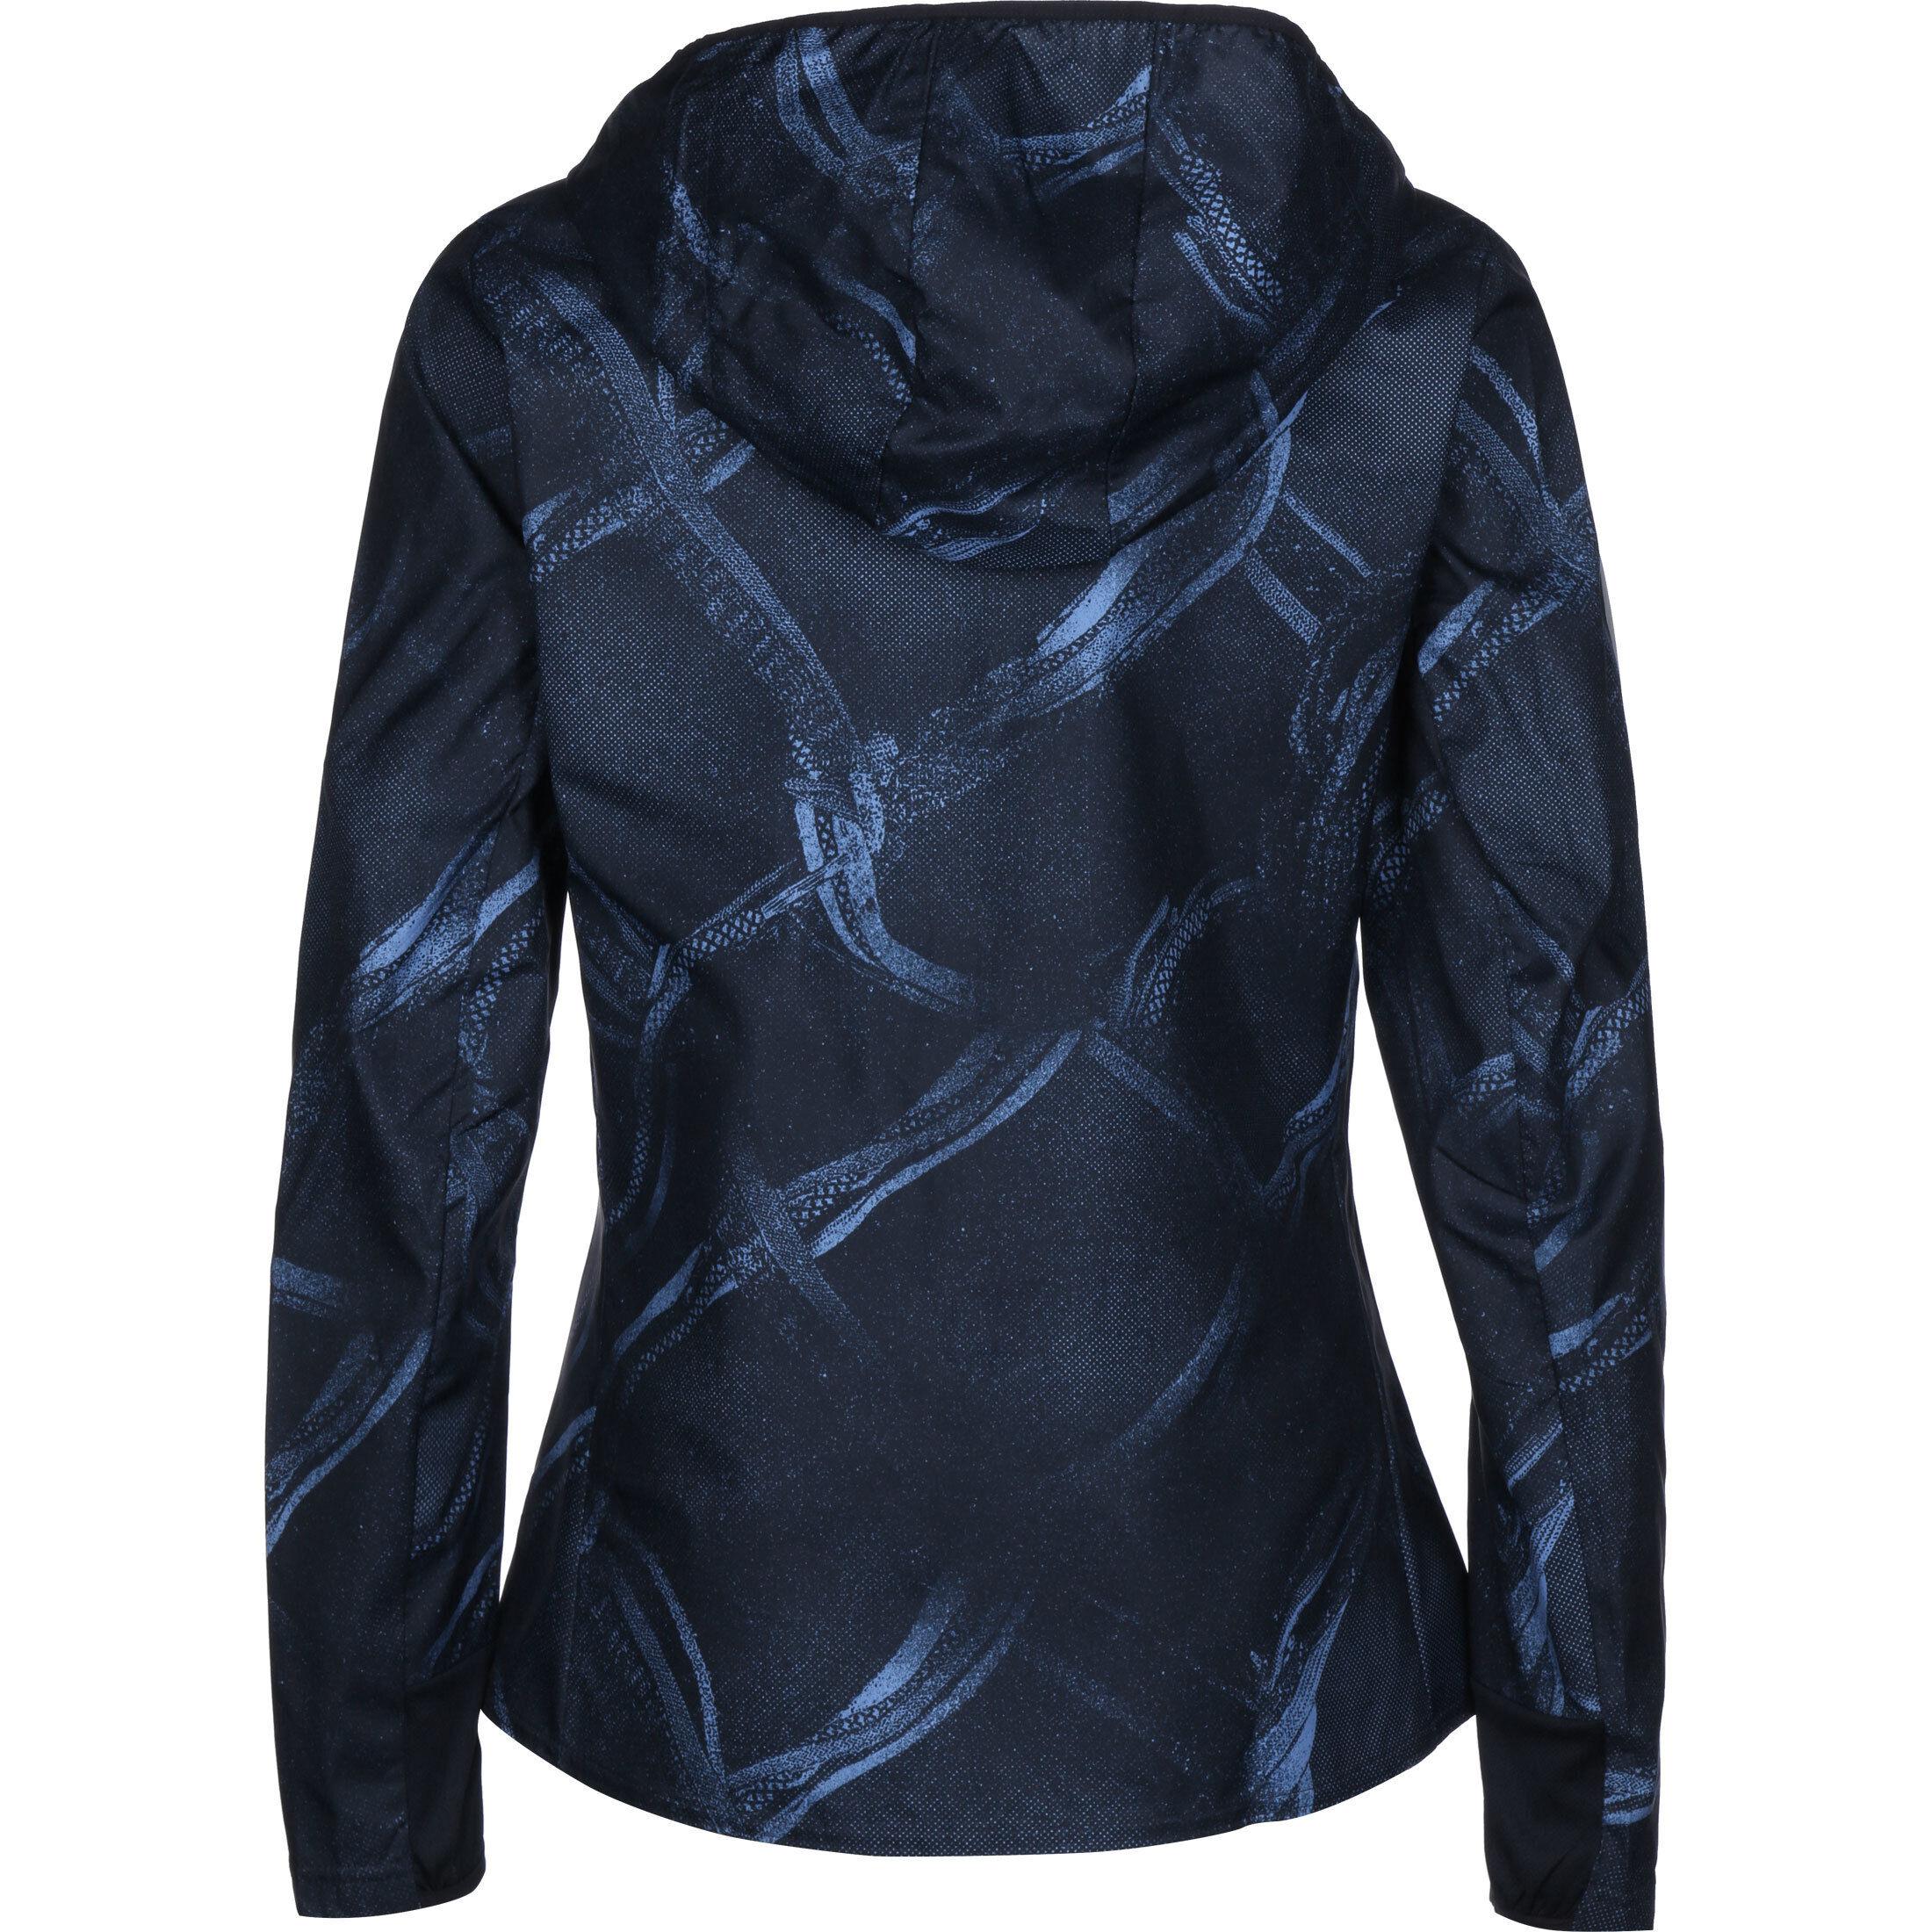 adidas Own The Run Jacket Laufjacke Damen Blau online kaufen